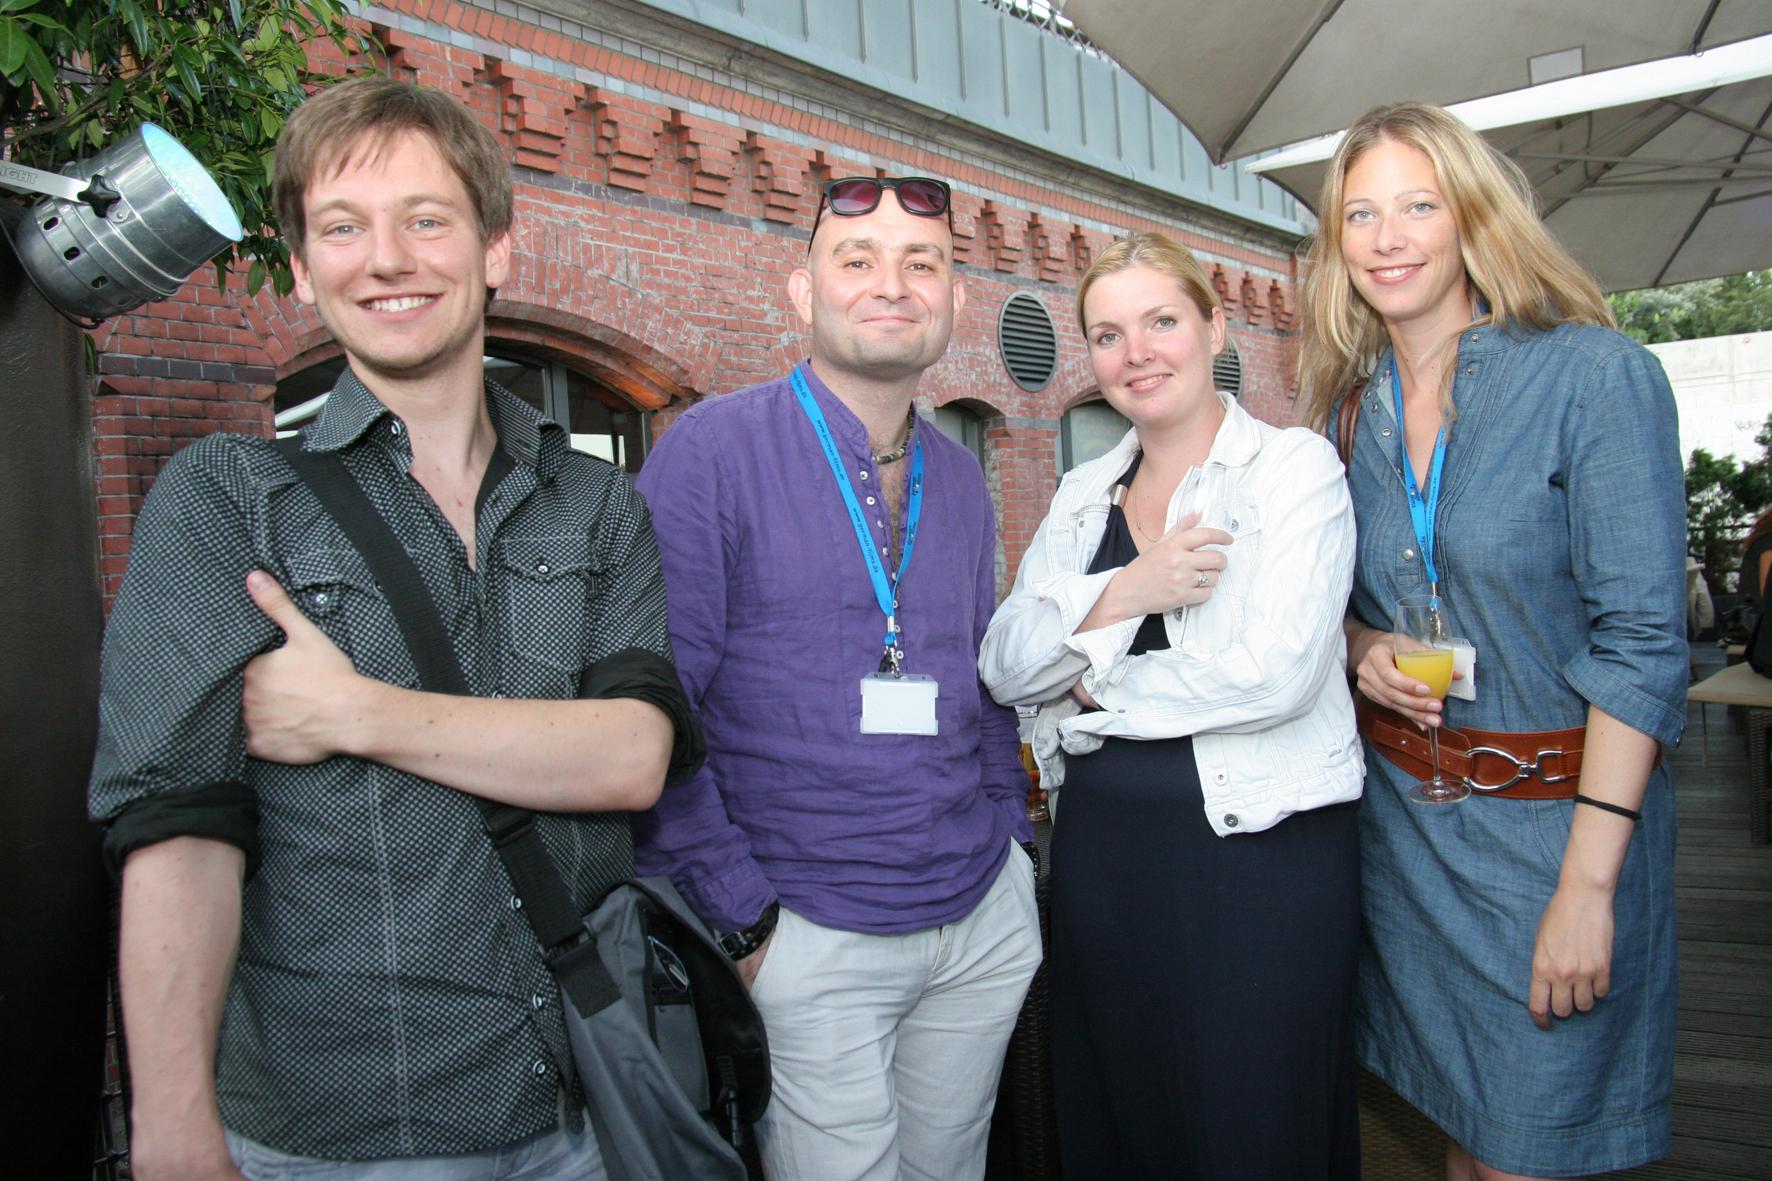 Bavaria International's Stefanie Zeitler (right) with Russian distributors, courtesy: Klaas Dierks/German Films